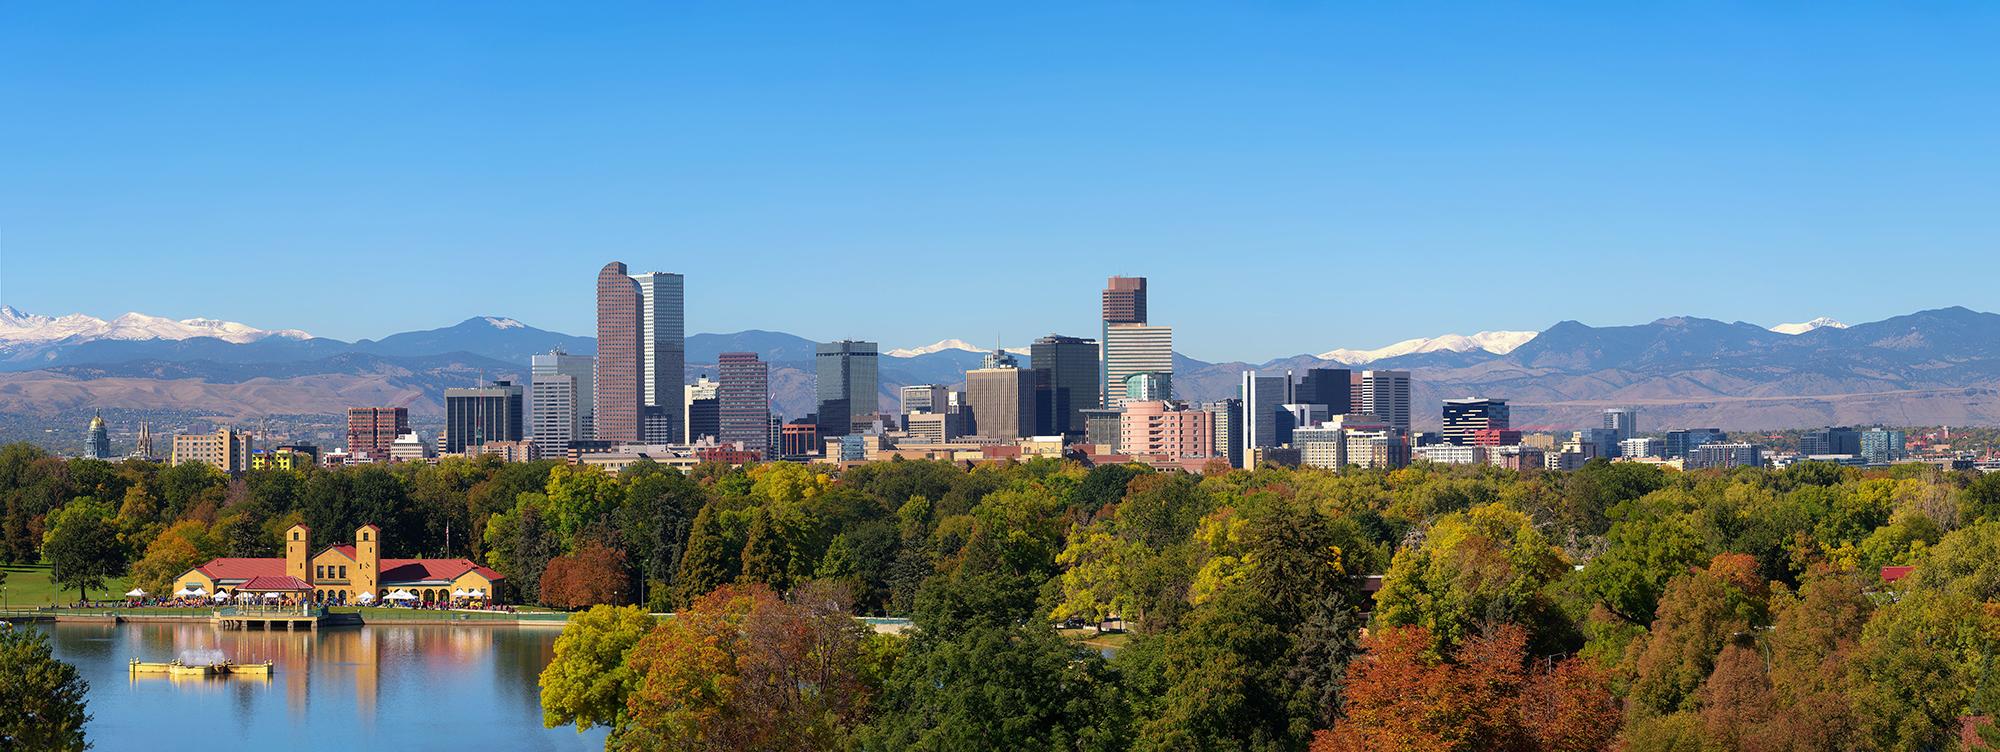 About Schmidt Law Group Denver